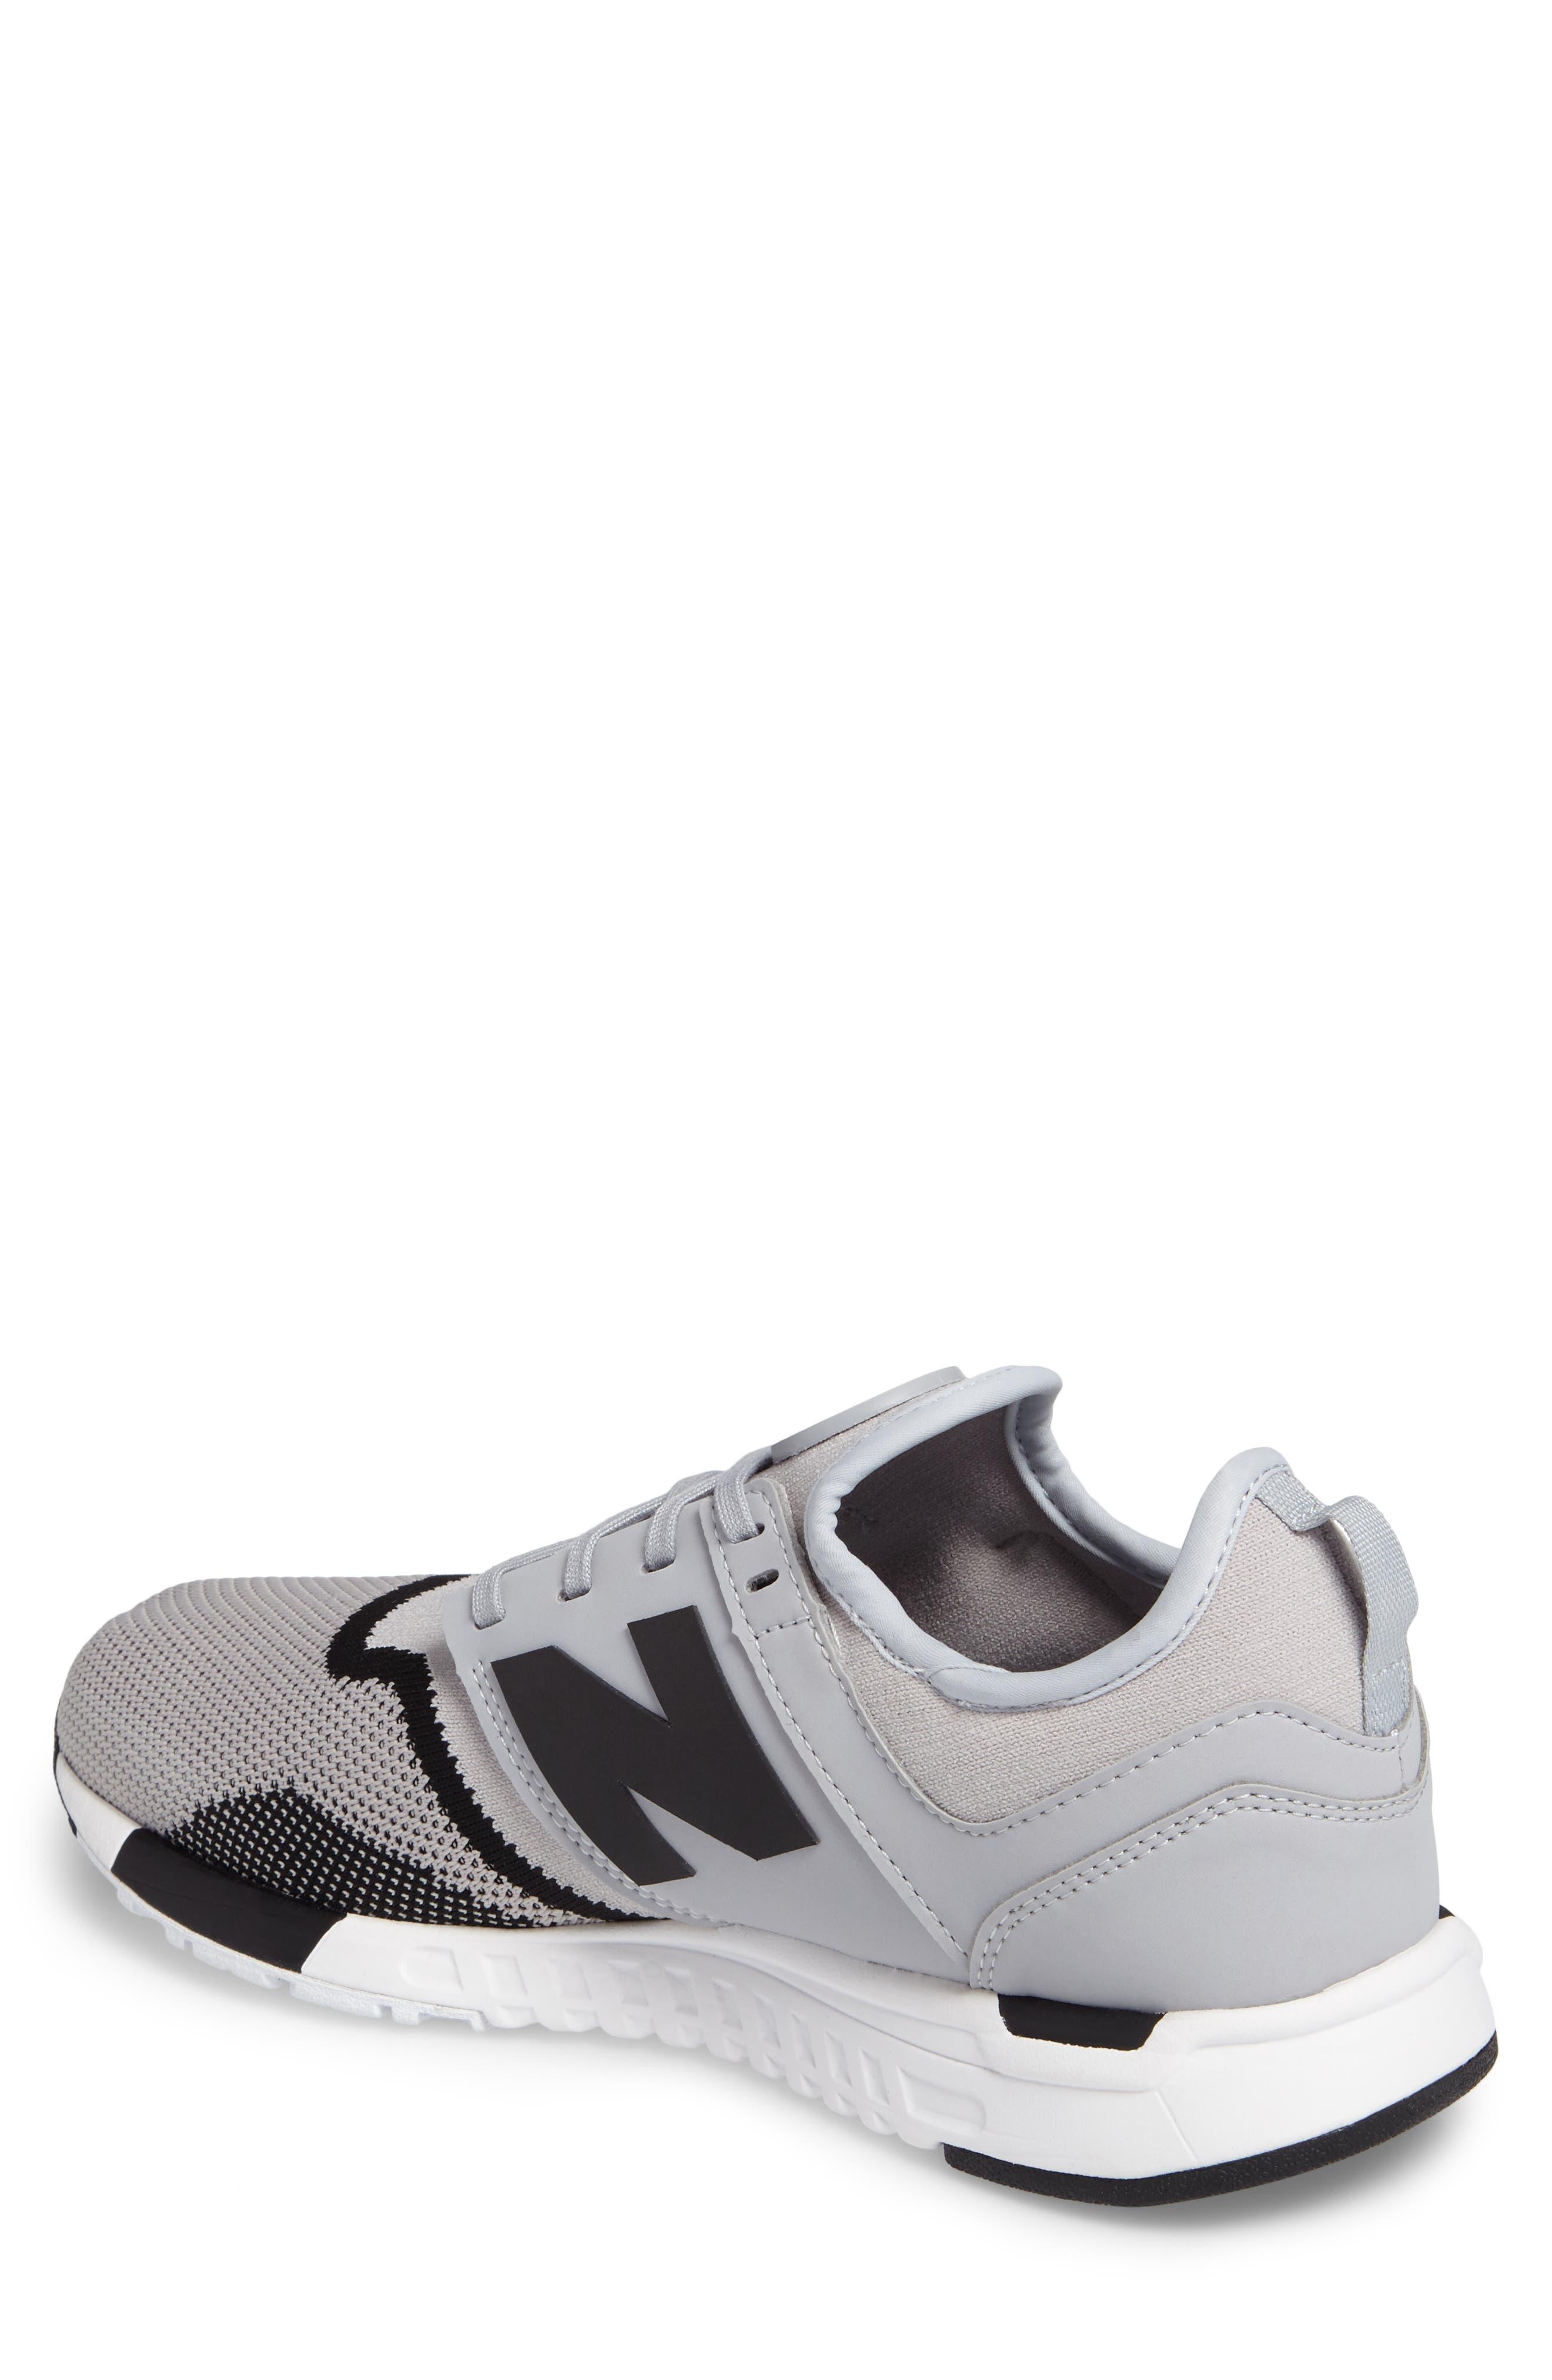 247 Sport Knit Sneaker,                             Alternate thumbnail 2, color,                             030